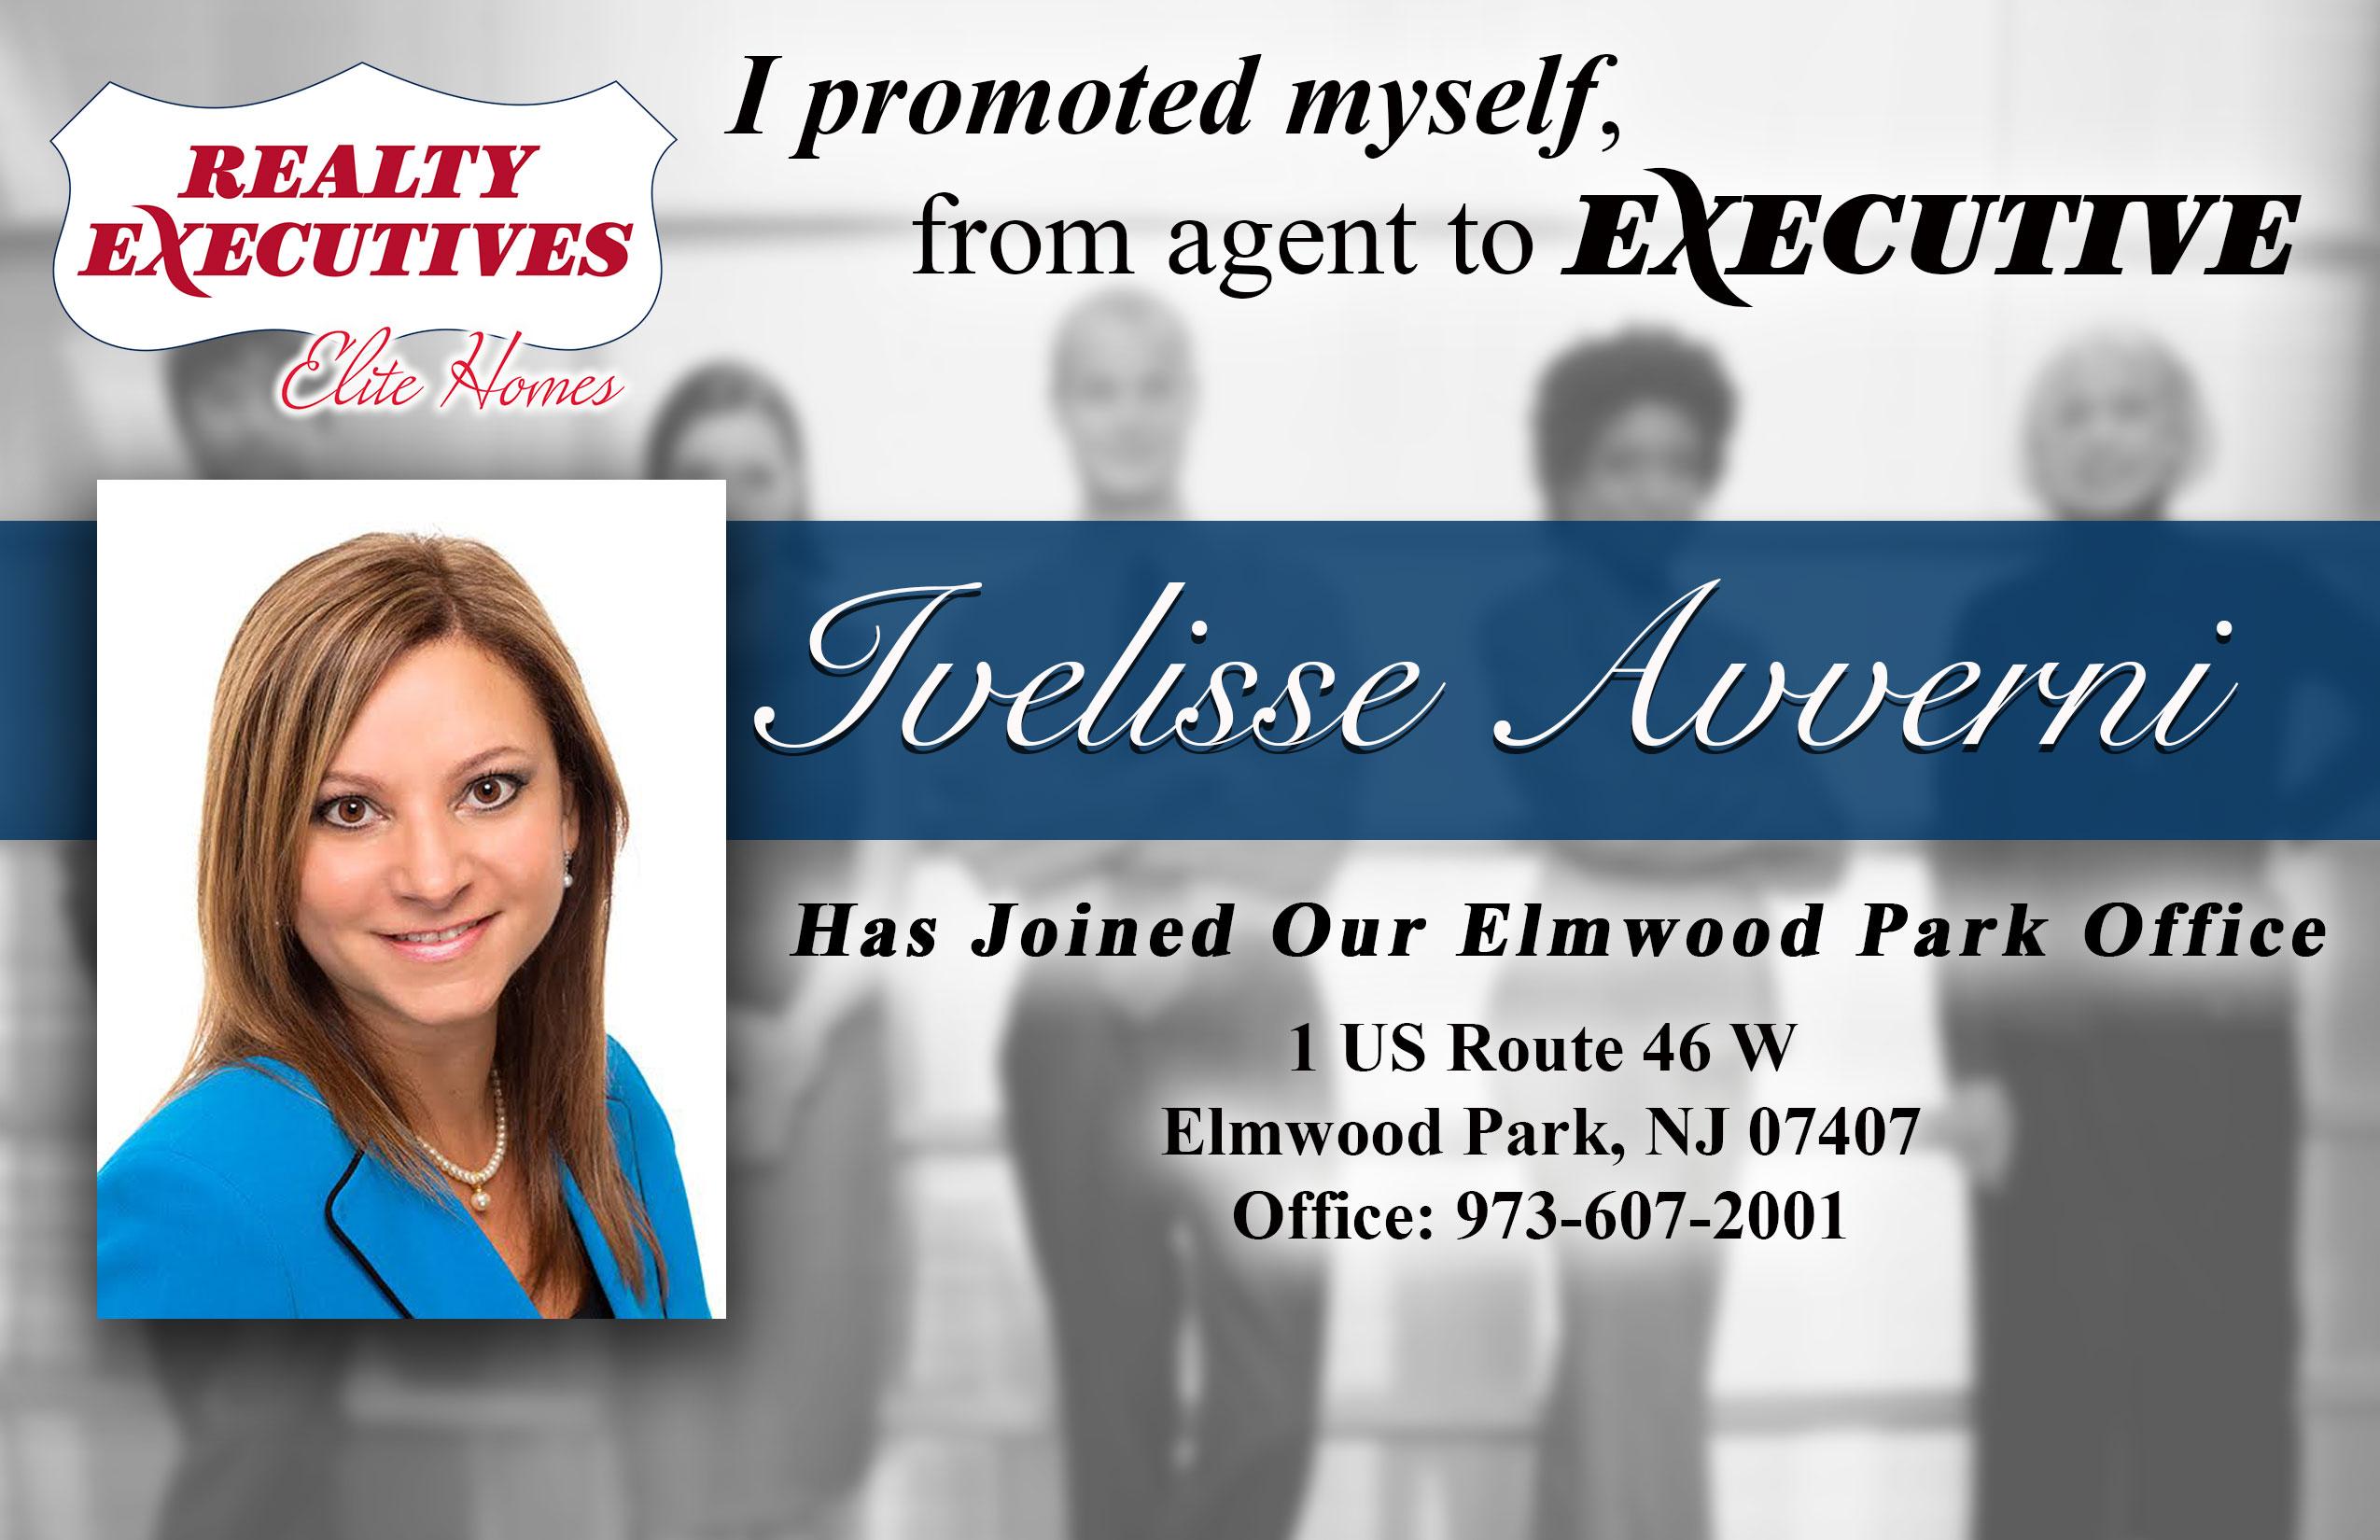 Ivelisse Avverni Joins Realty Executives Elite Homes